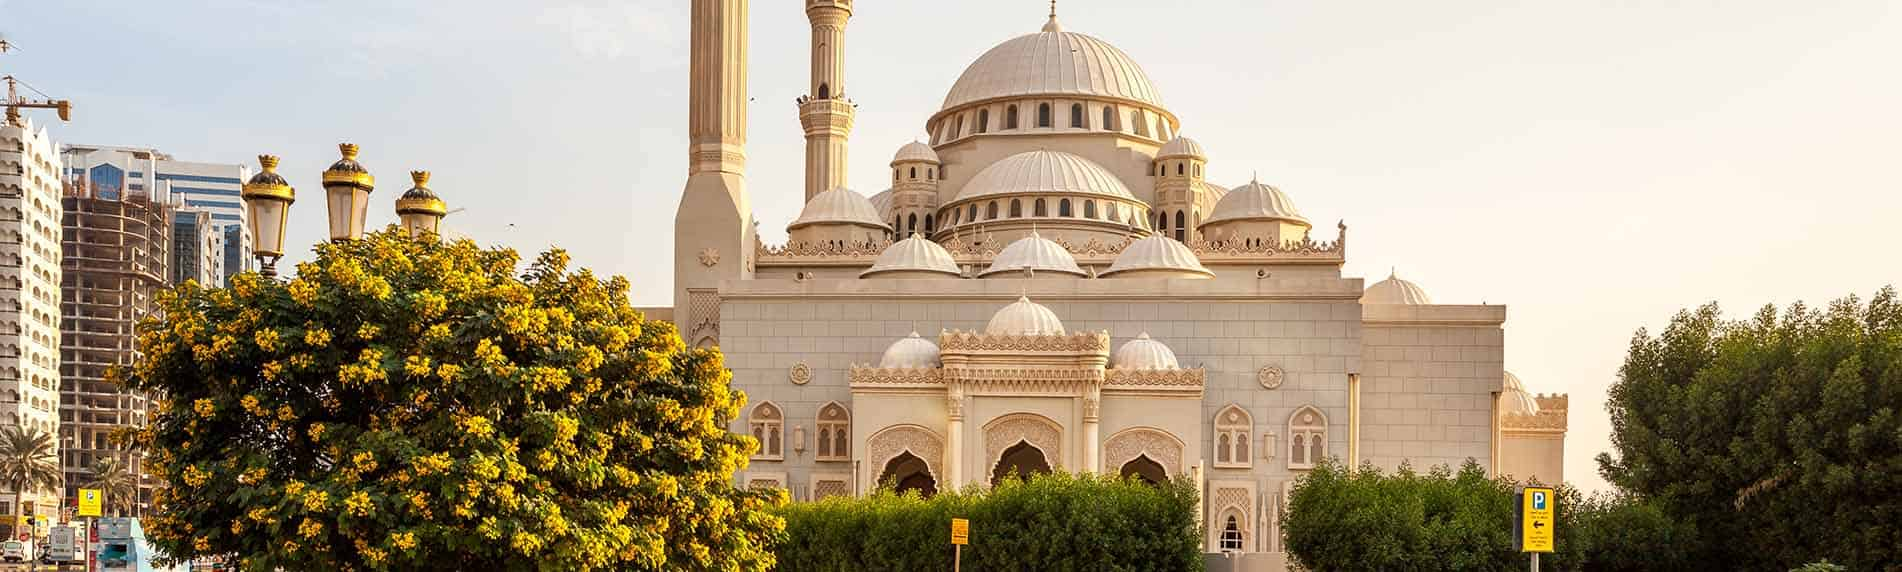 sharjah city from dubai